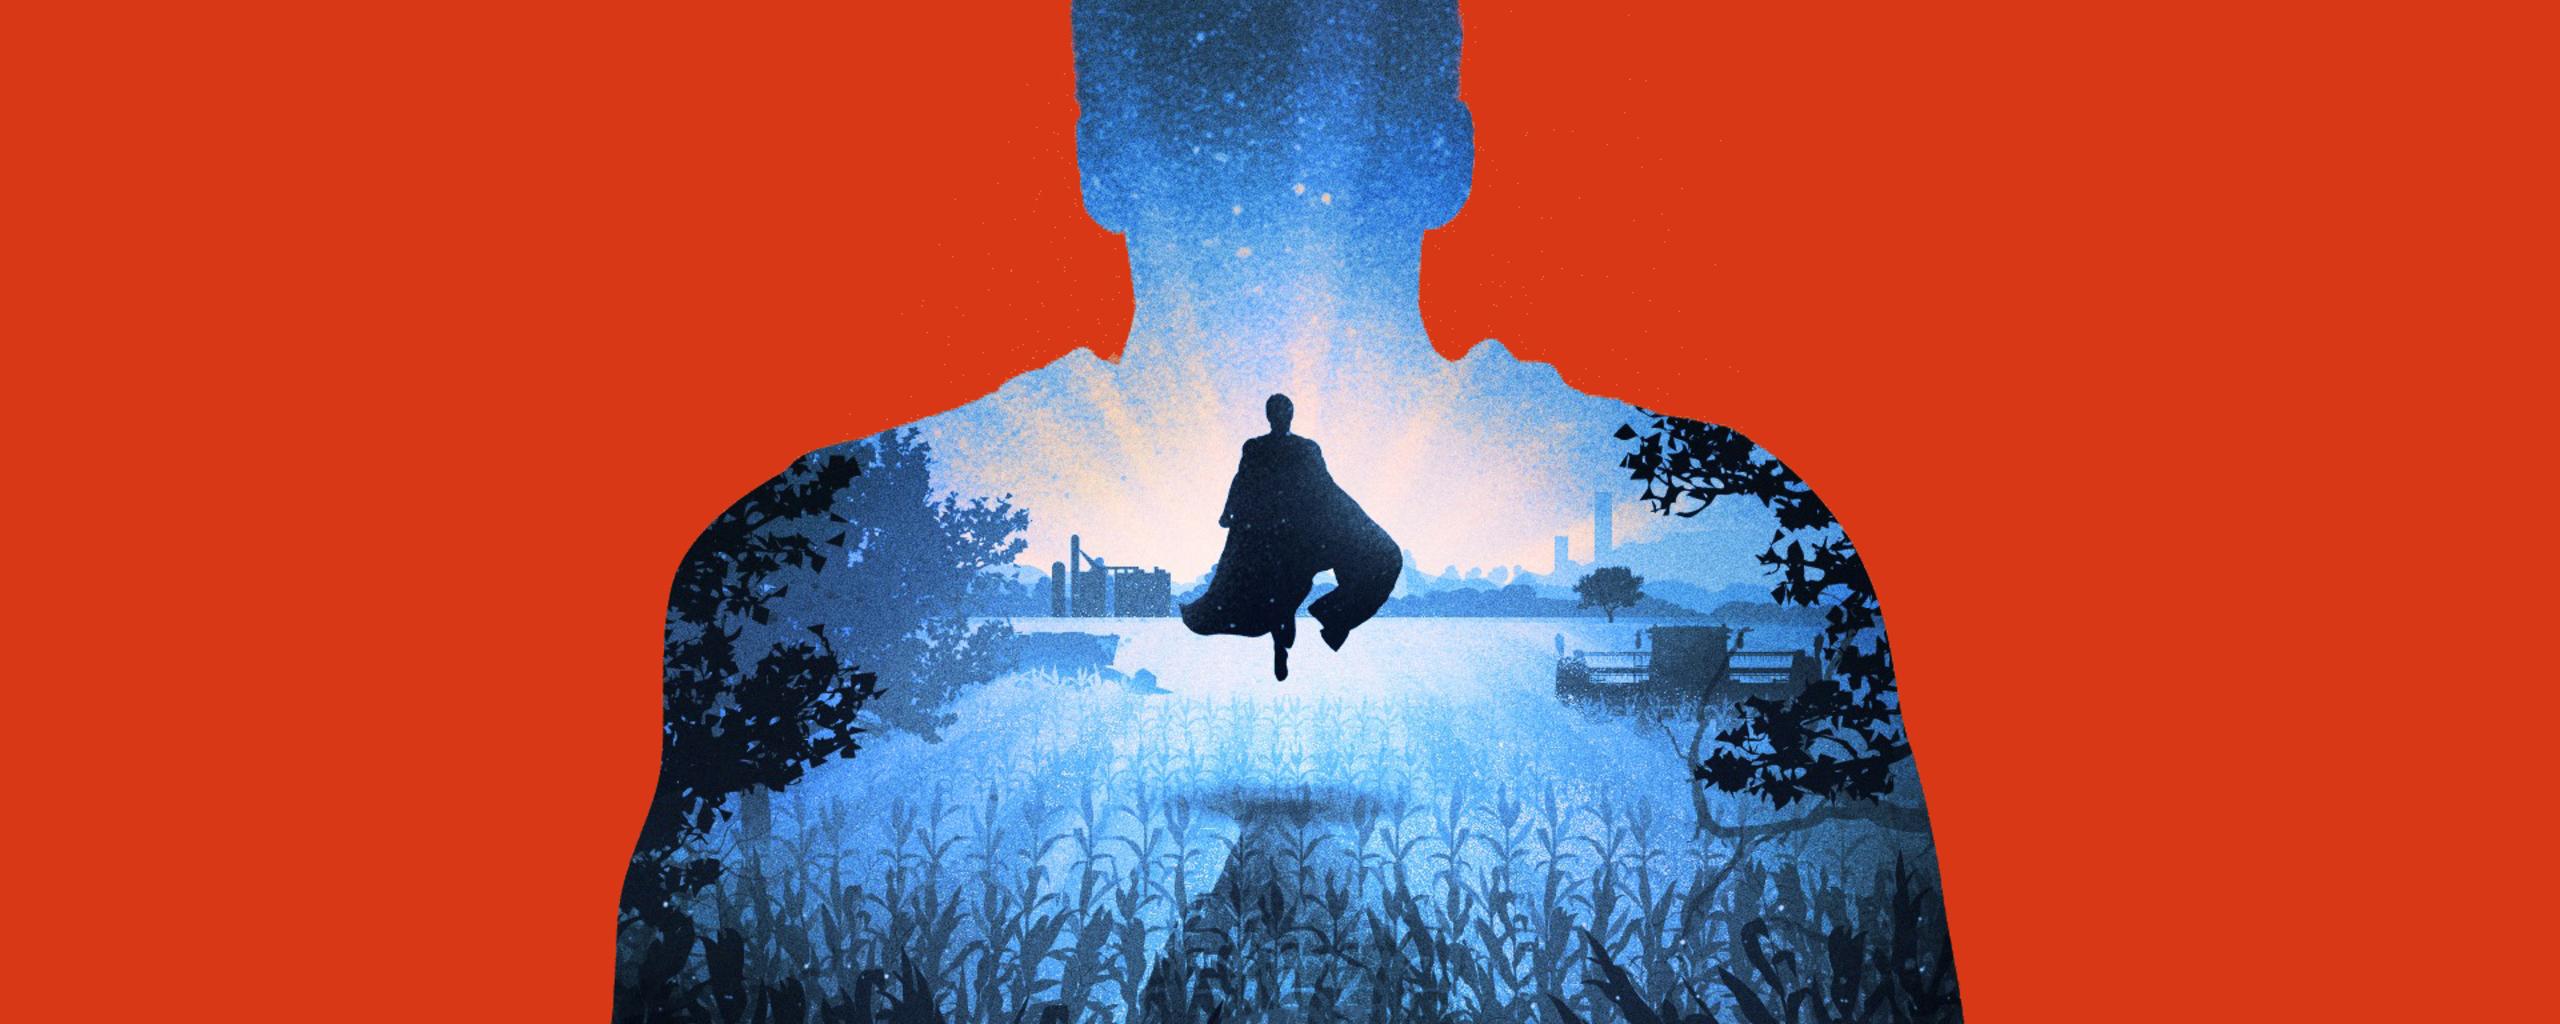 justice-league-superman-artwork-7h.jpg